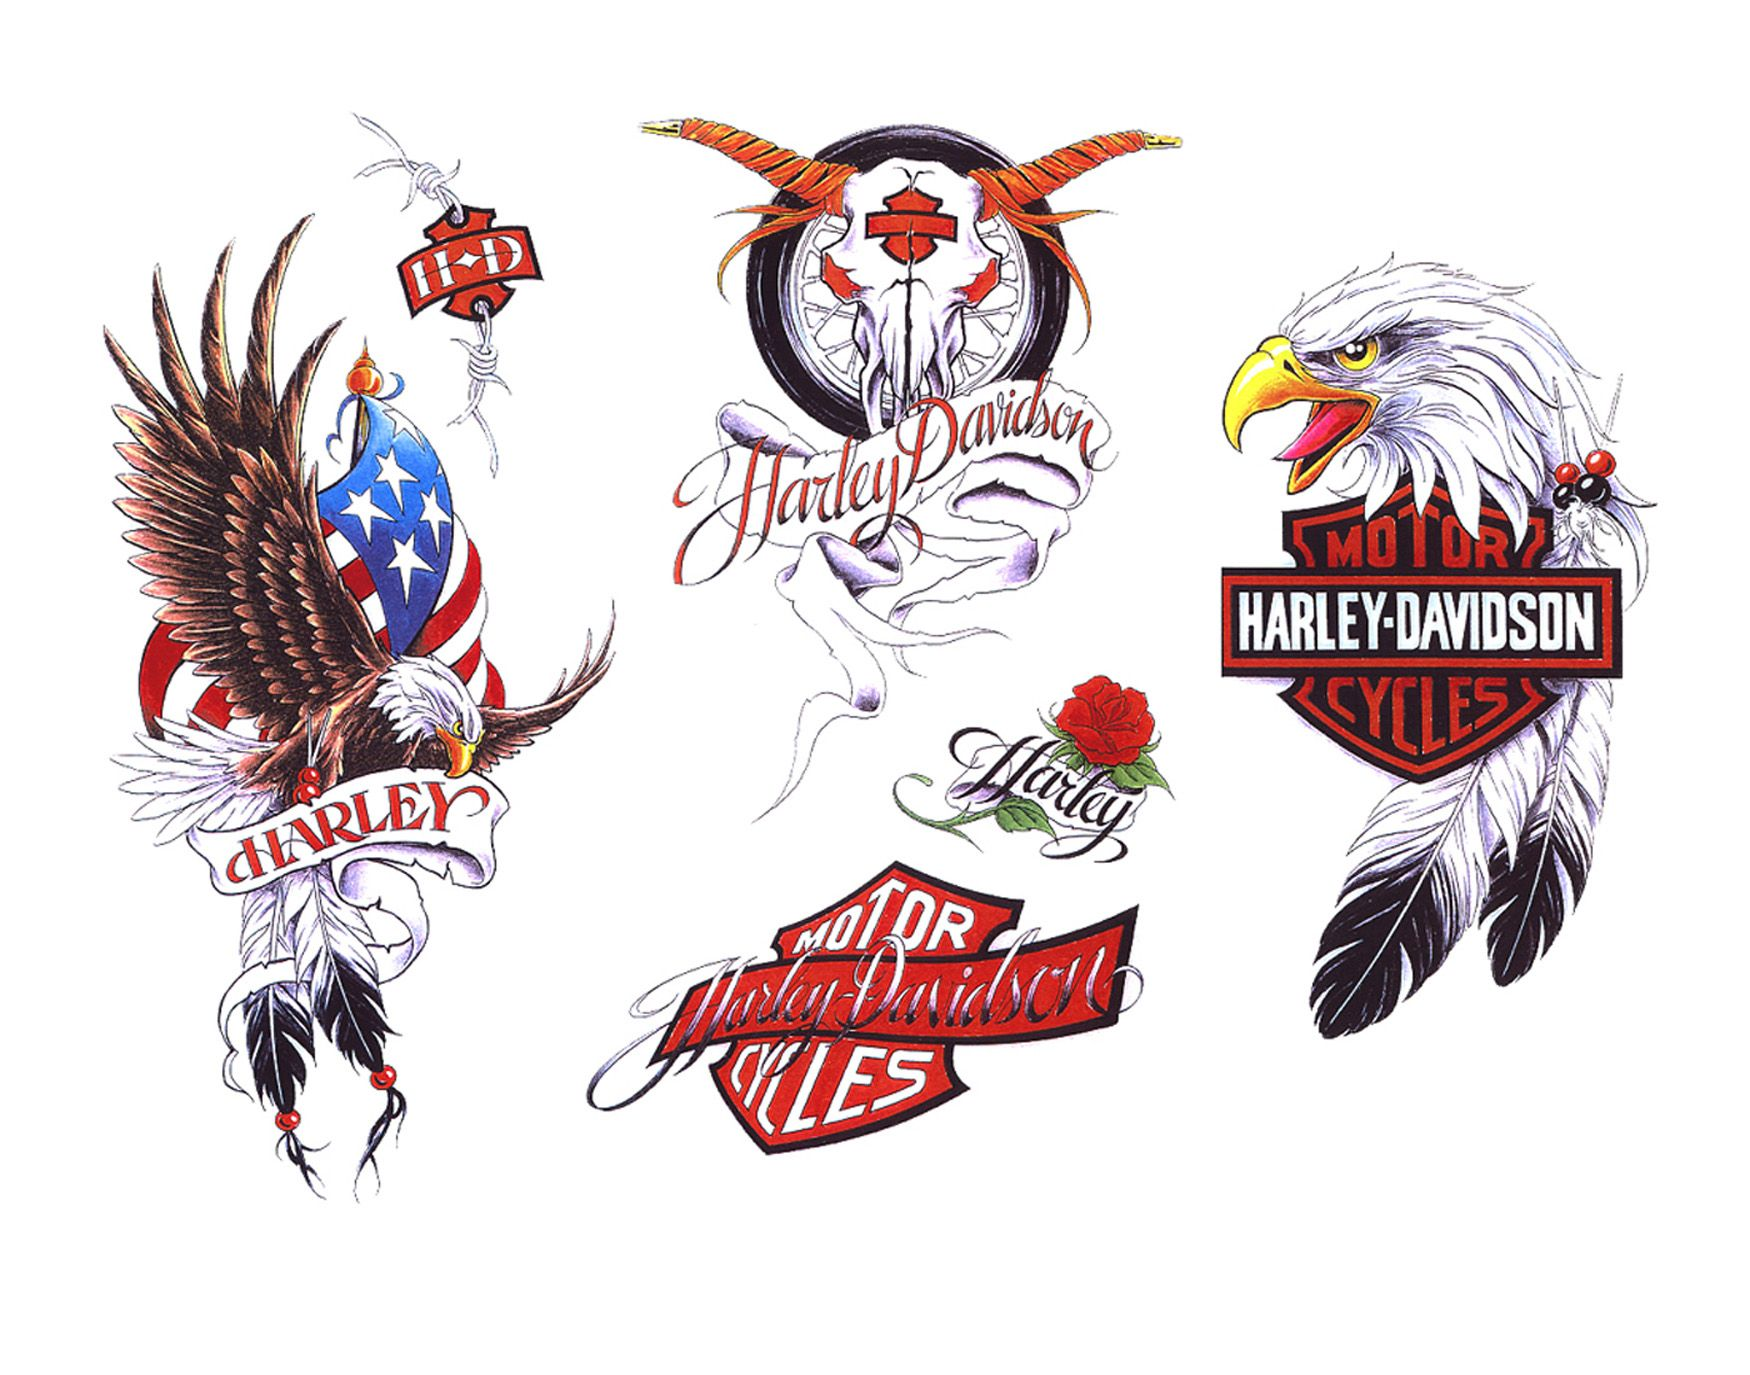 Harley Davidson Tattoos Harley Davidson Tattoos Harley Davidson Signs Harley Davidson Logo